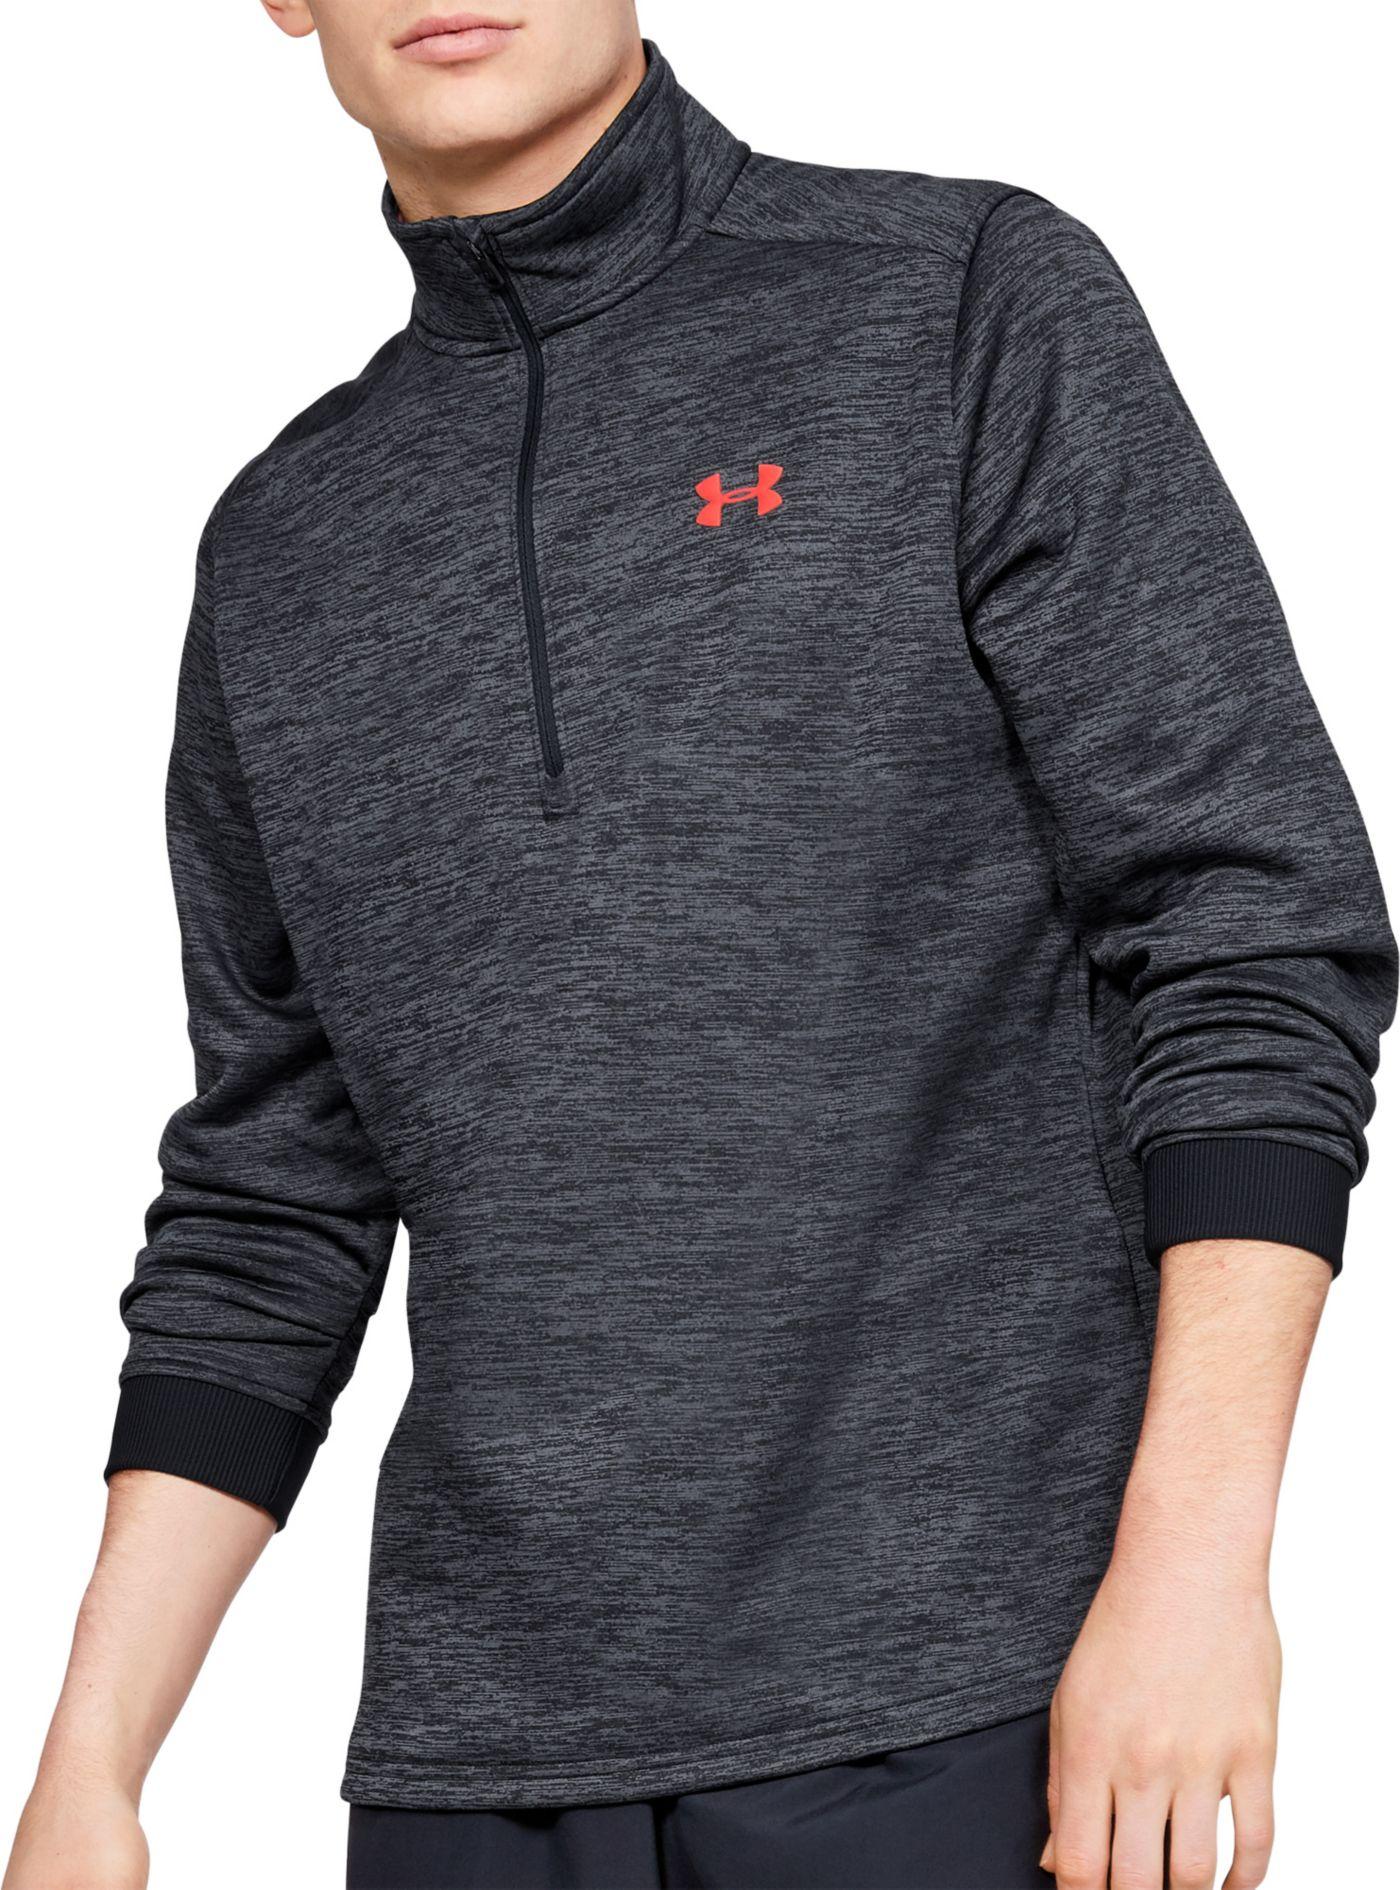 Under Armour Men's Armour Fleece ½ Zip Long Sleeve Shirt